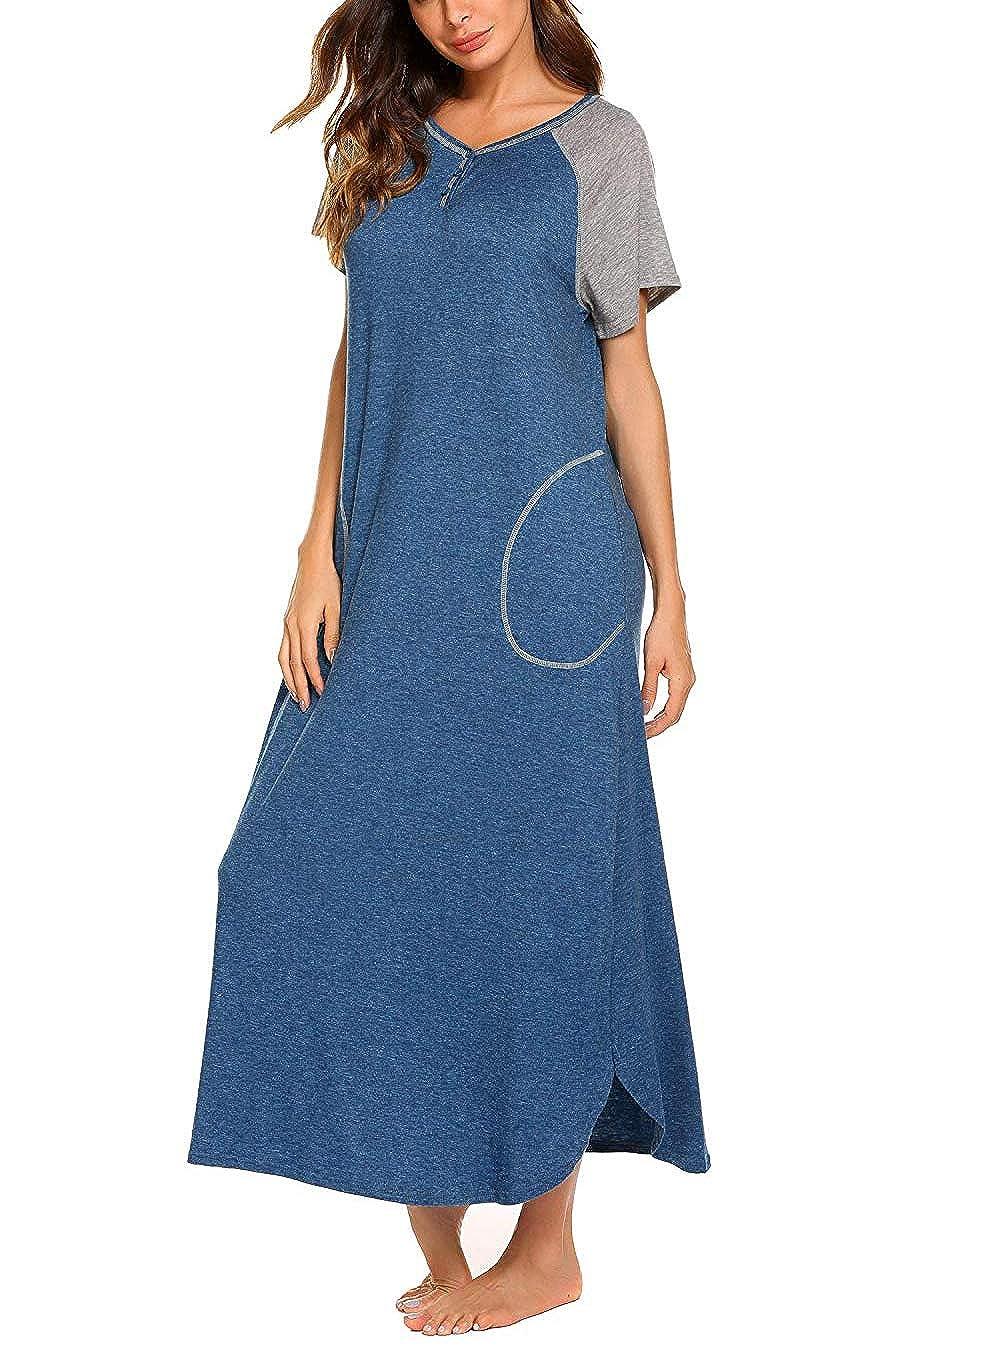 Sleepwear Women/'s Nightshirt Short Sleeve Nightgown with Pocket Sleep Dress Full Length